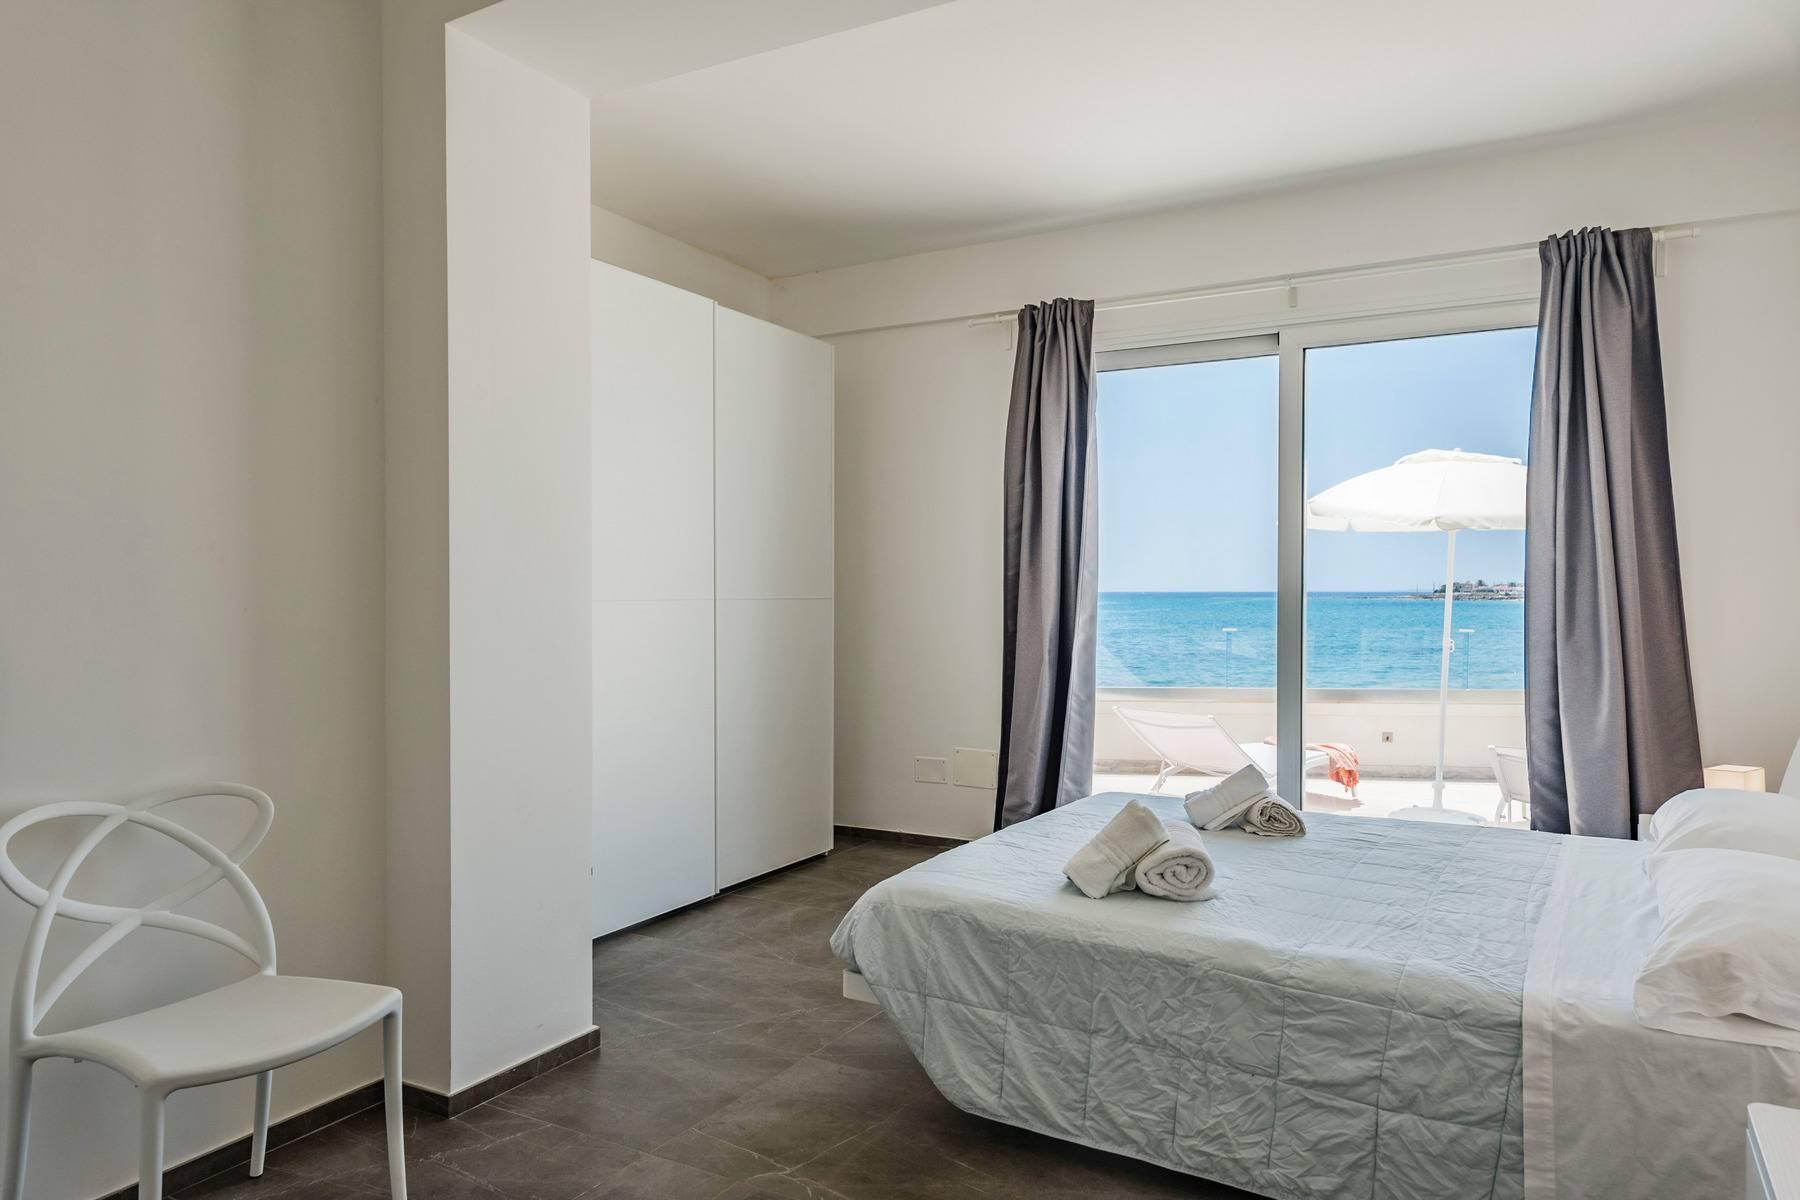 Exclusive villa with sea view in Avola - 13